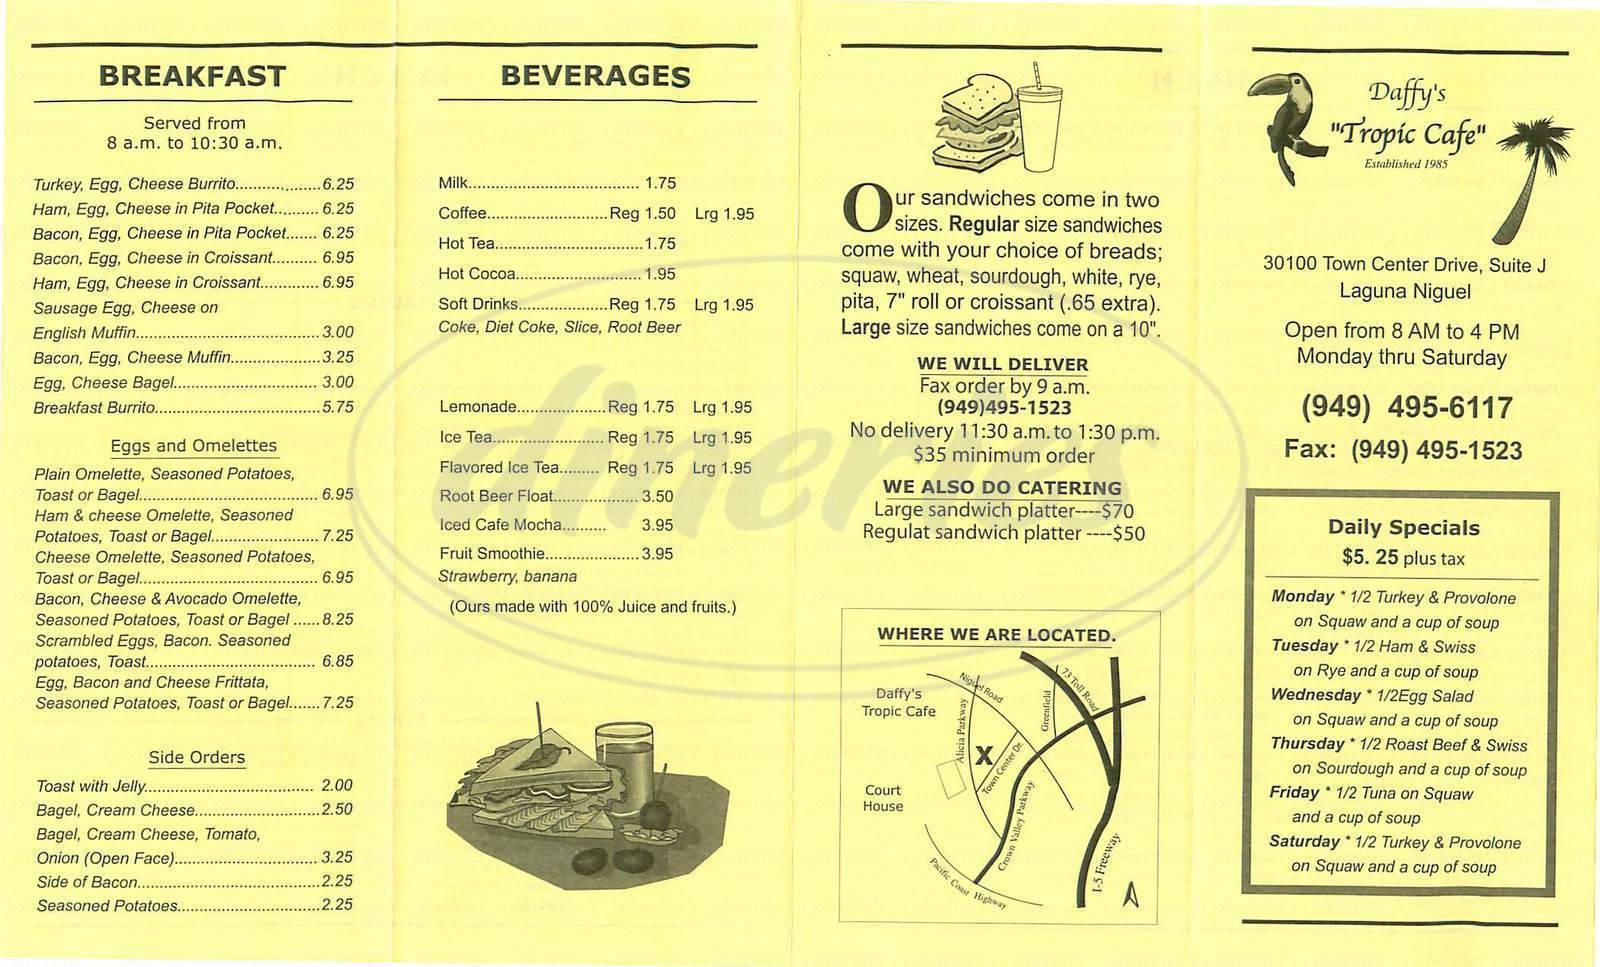 menu for Daffy's Tropic Cafe